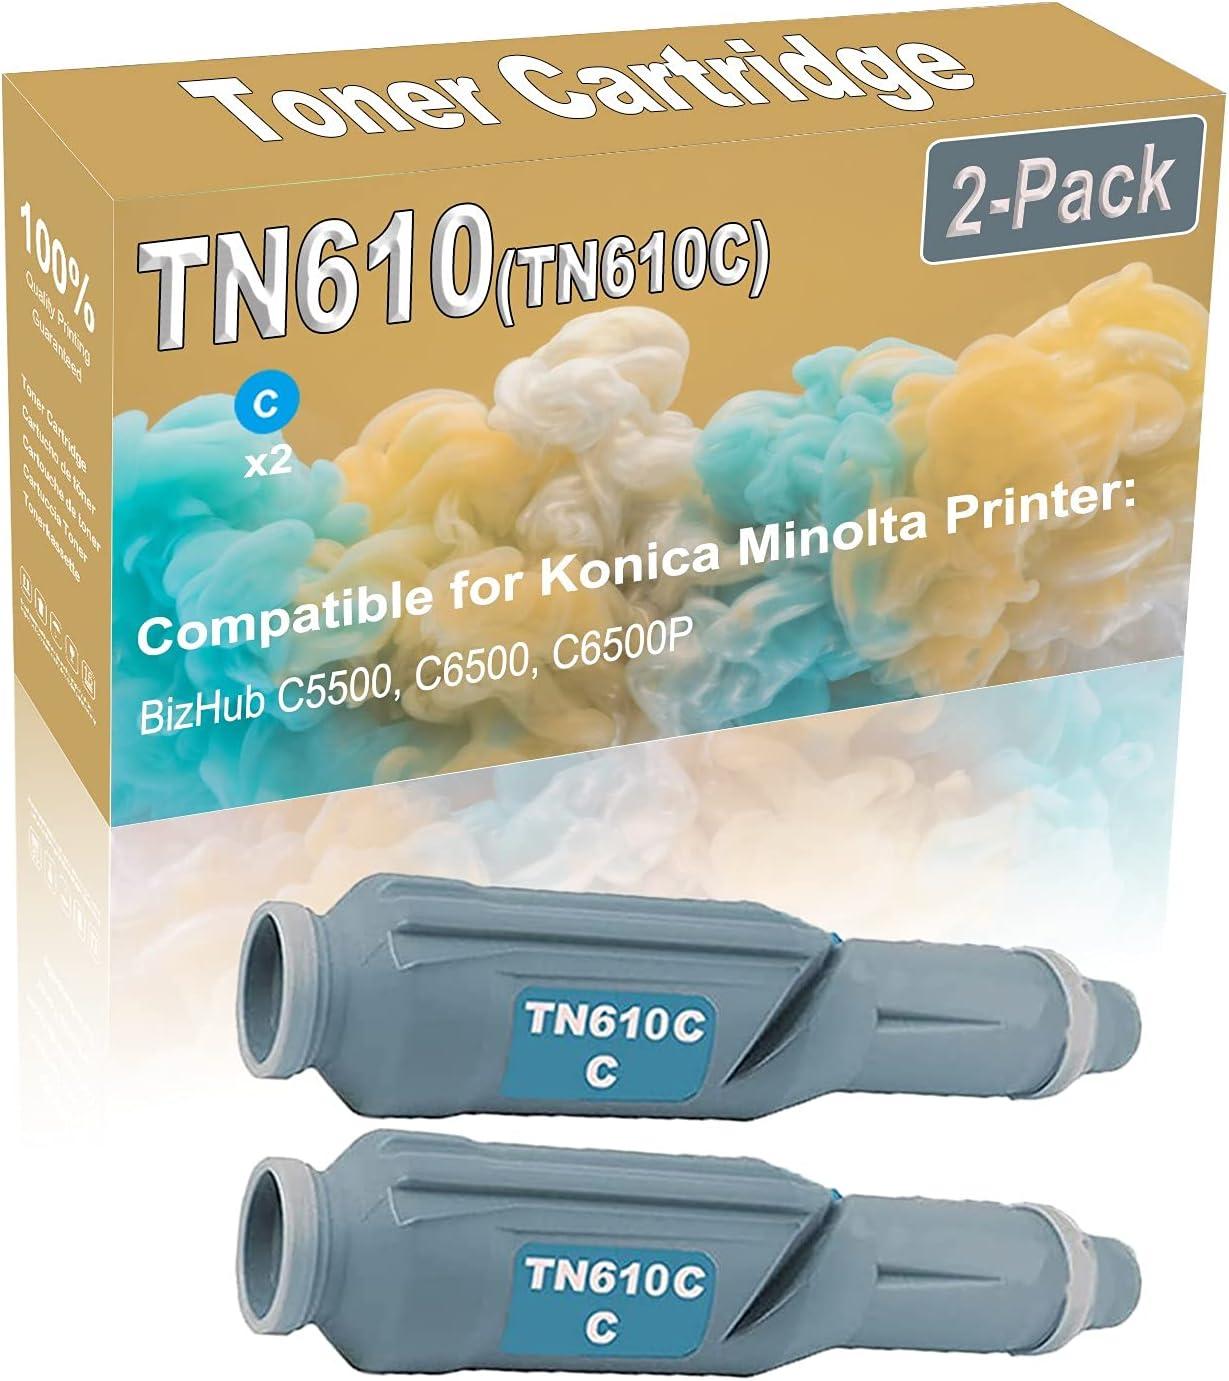 2-Pack (Cyan) Compatible BizHub C5500 C6500 Laser Printer Toner Cartridge (High Capacity) Replacement for Konica Minolta TN610 (TN610C) Printer Toner Cartridge